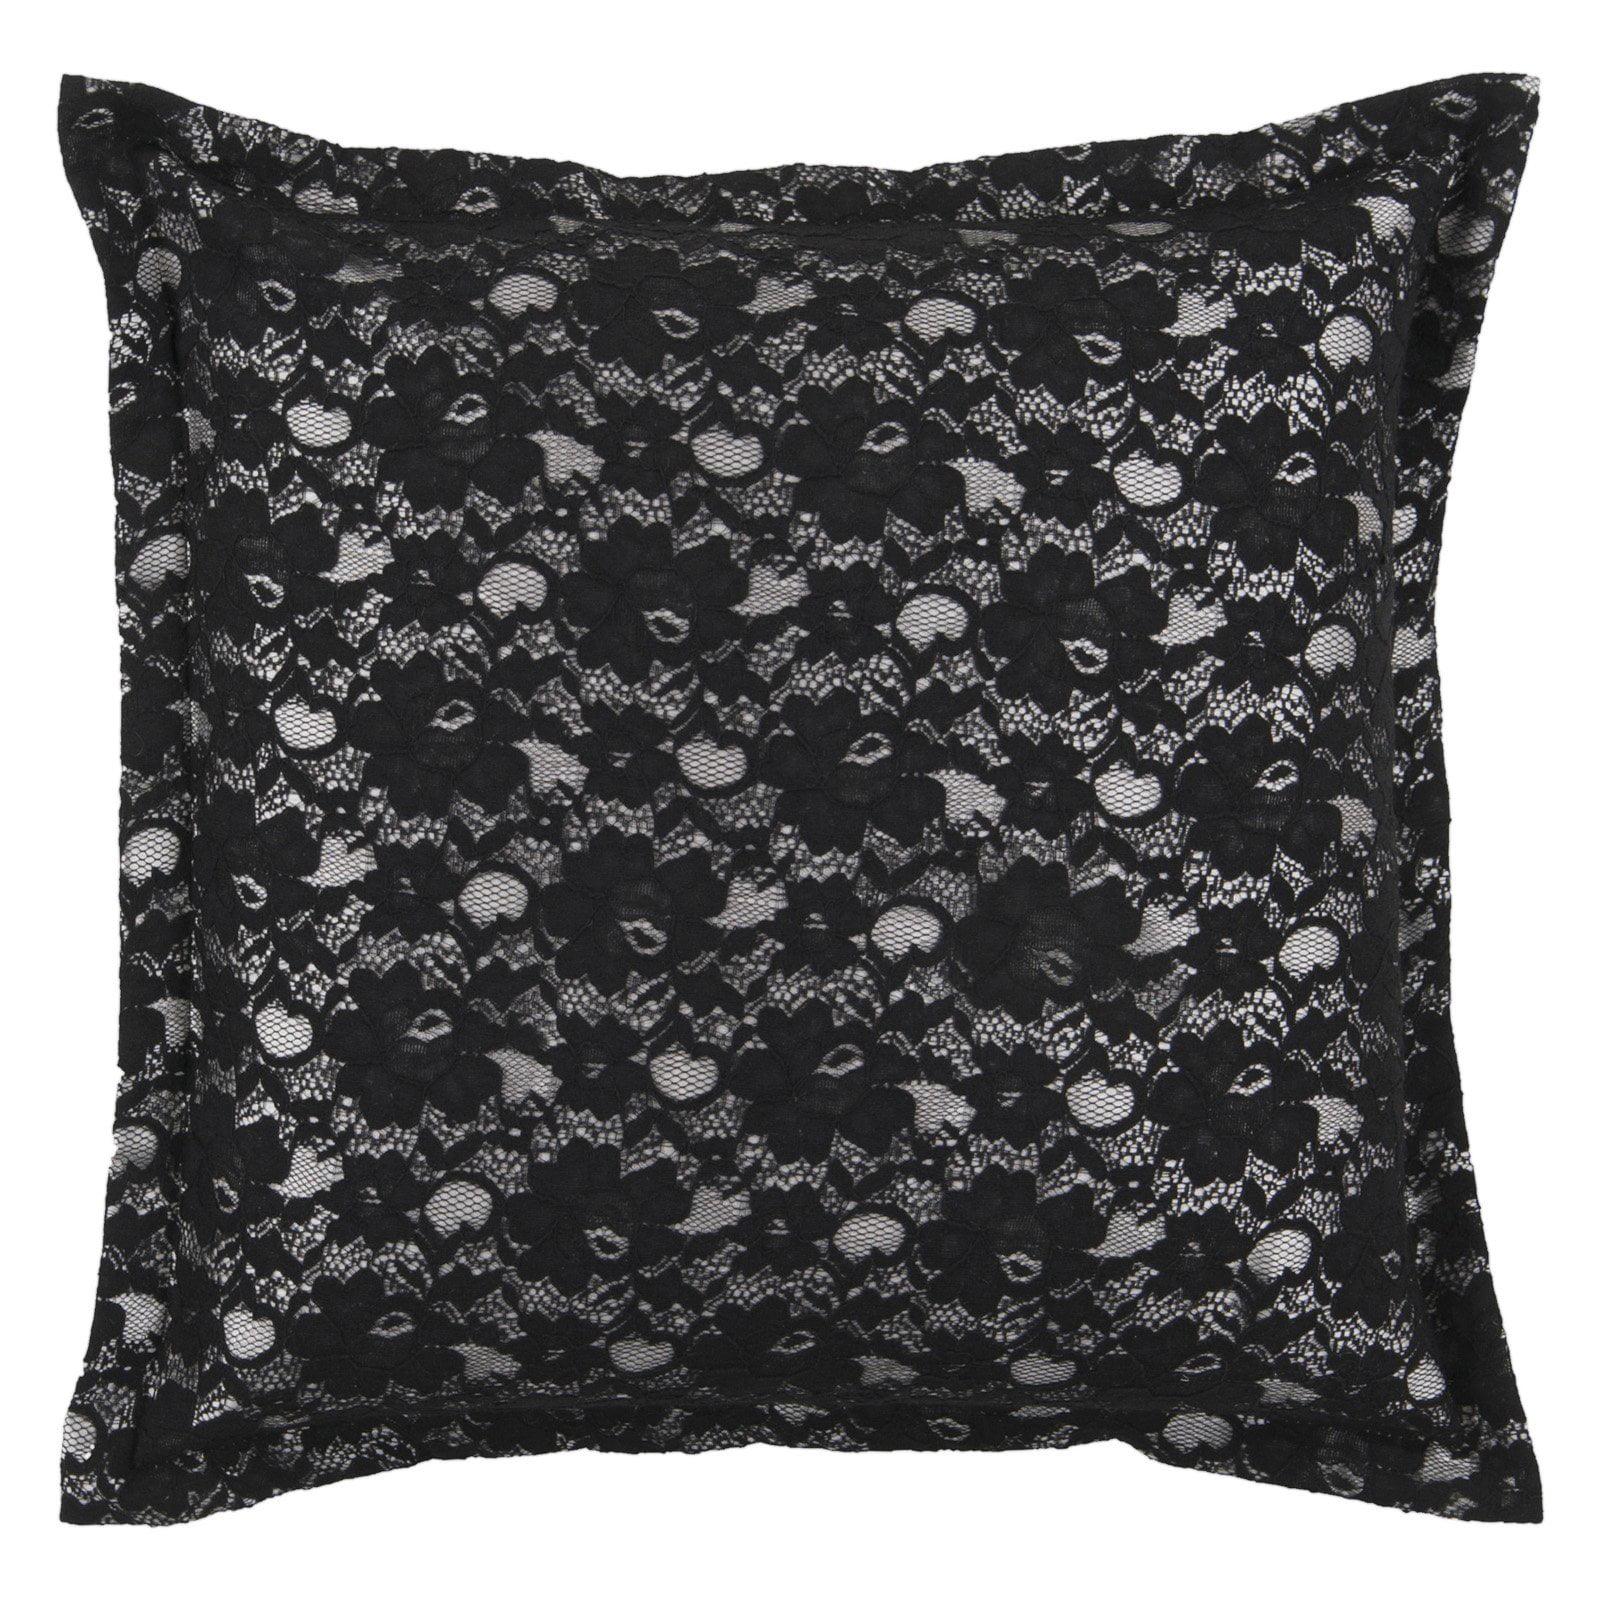 Surya Bordello Decorative Pillow - Caviar